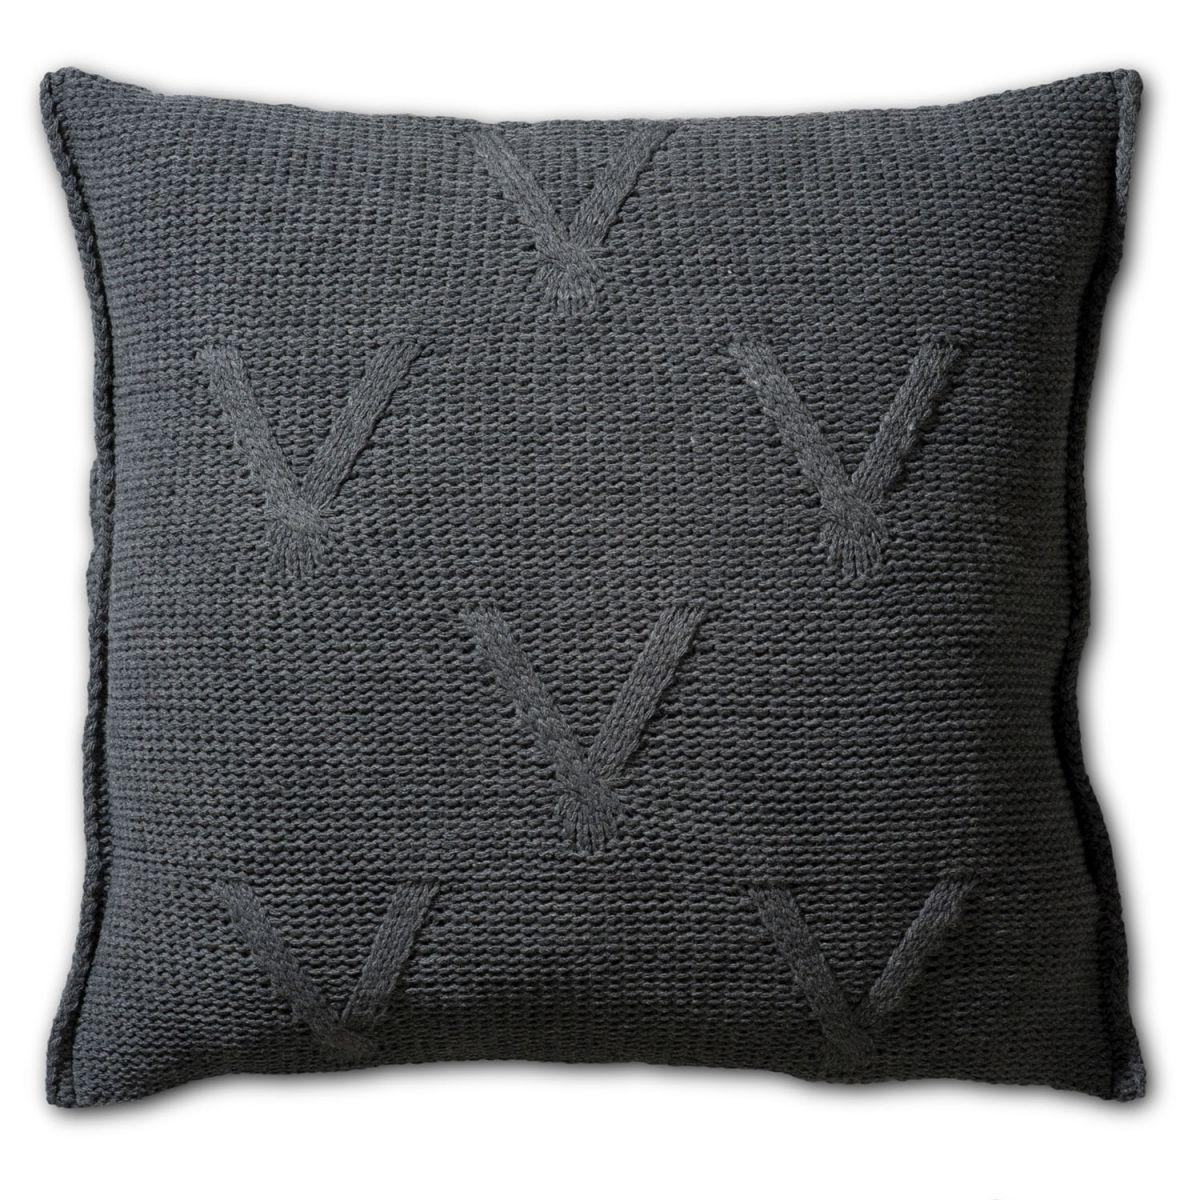 knit factory 1101210 kussen 50x50 aran antraciet 2